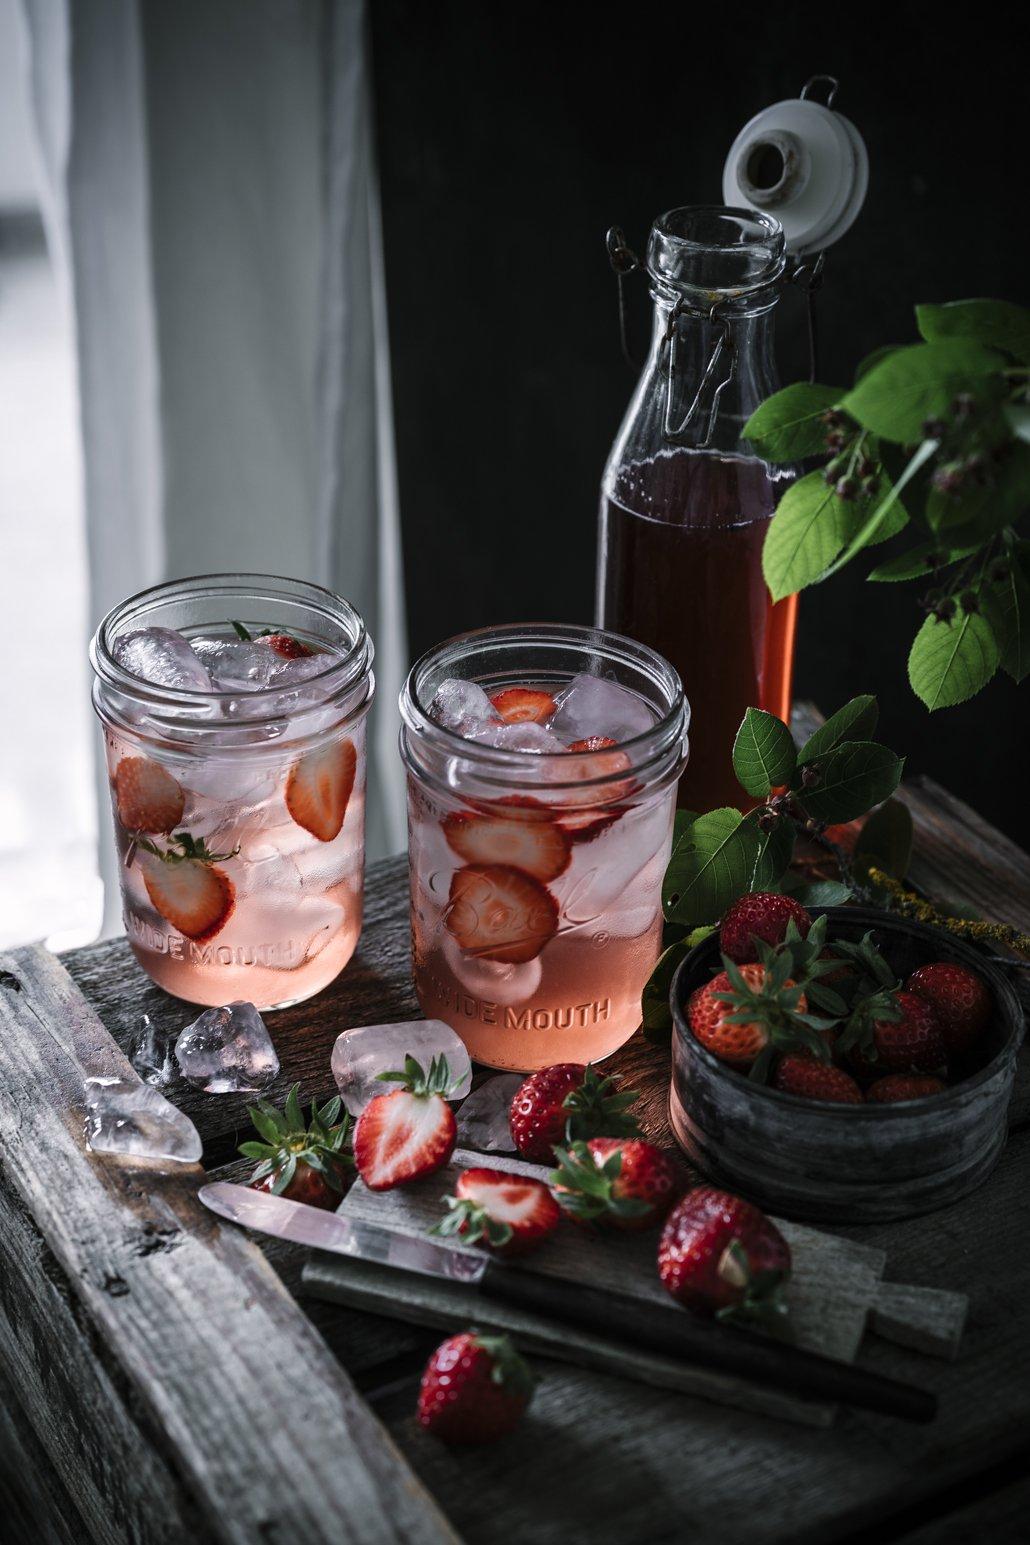 Selbstgemachter Erdbeerminz Sirup